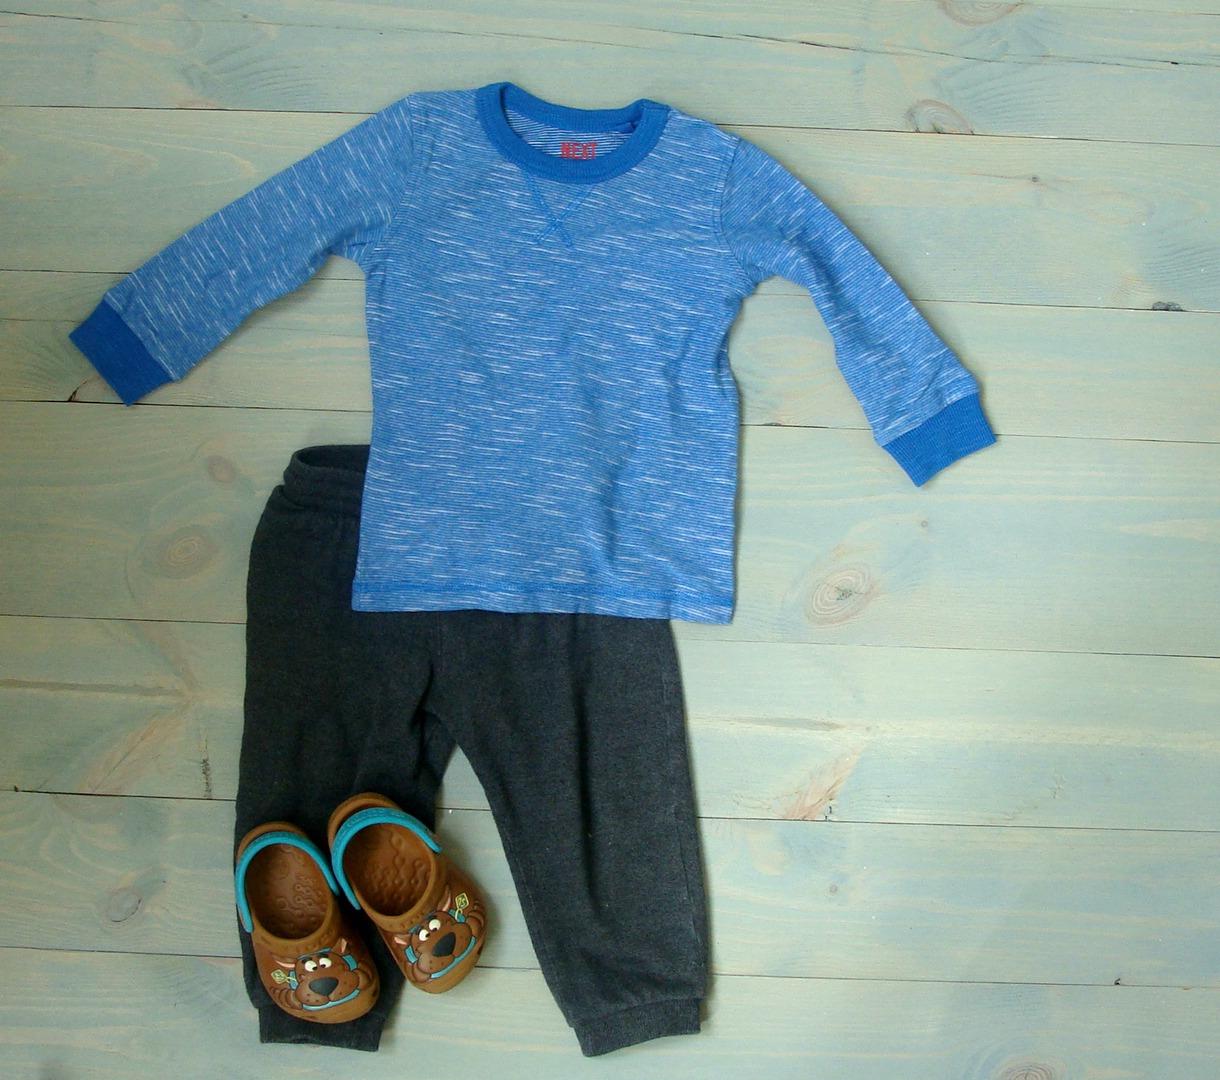 Tanie ubrania dla dziecka, lumpeks, second hand